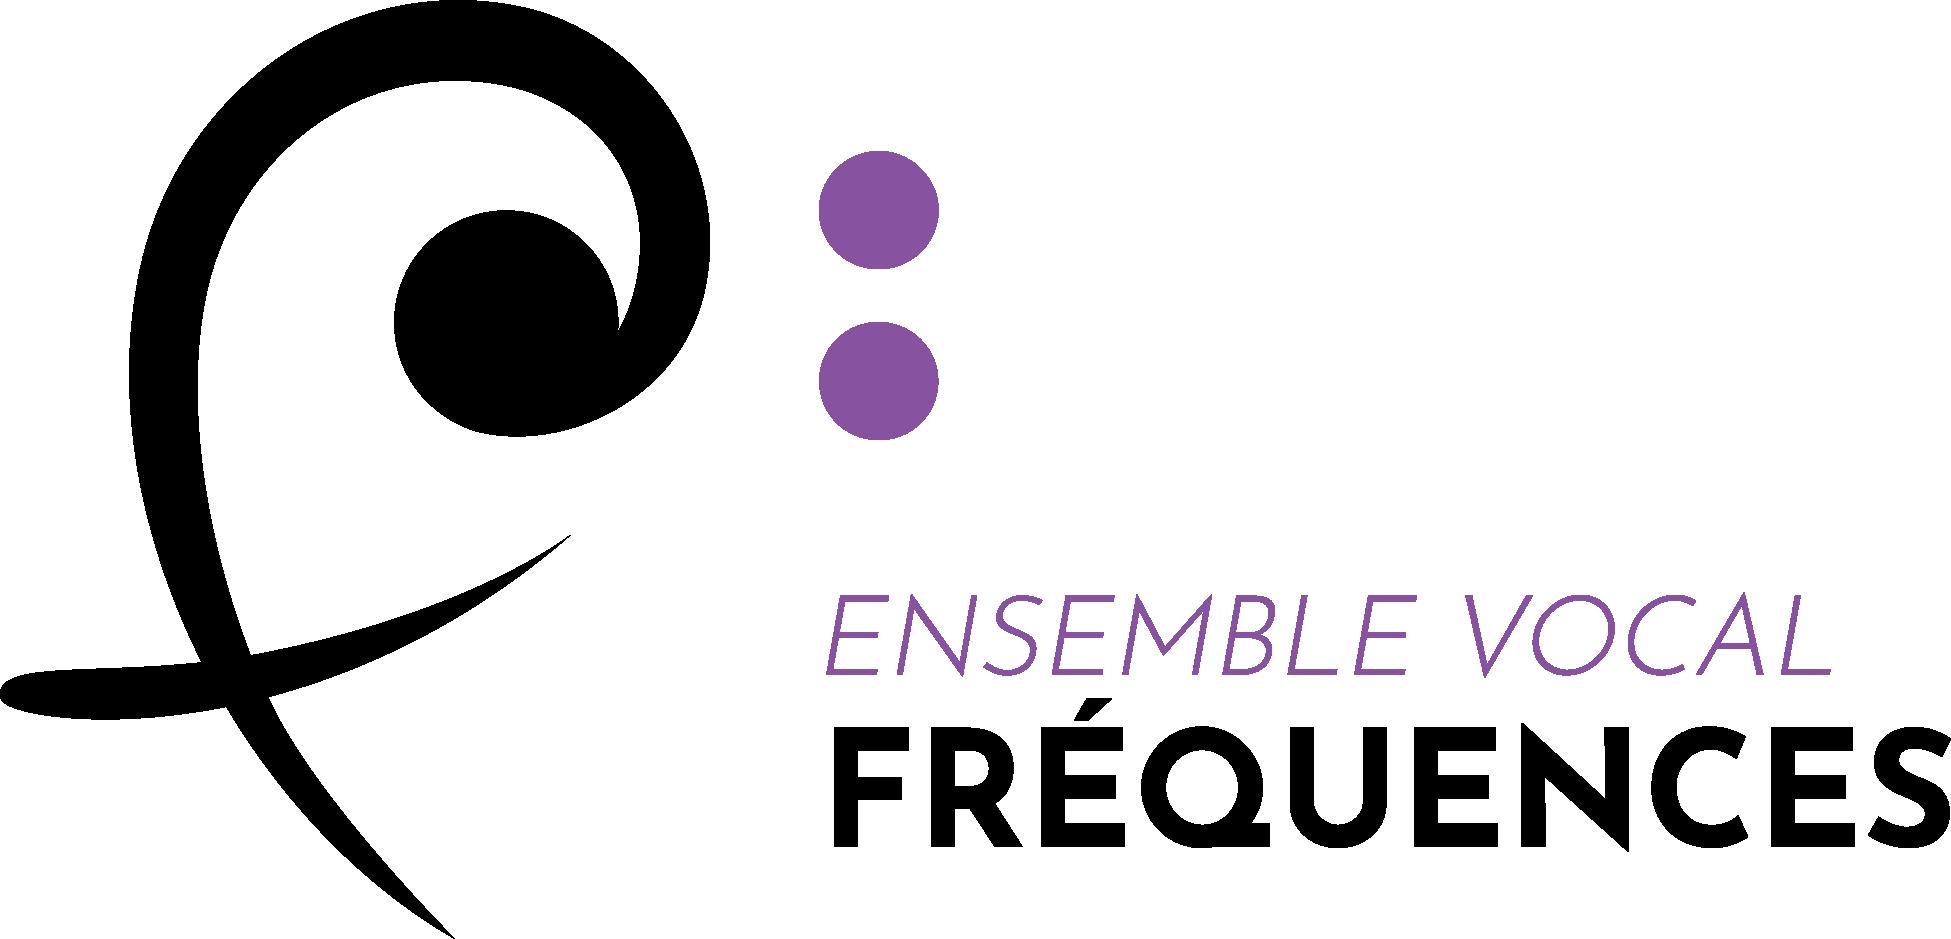 Ensemble vocal FREQUENCES